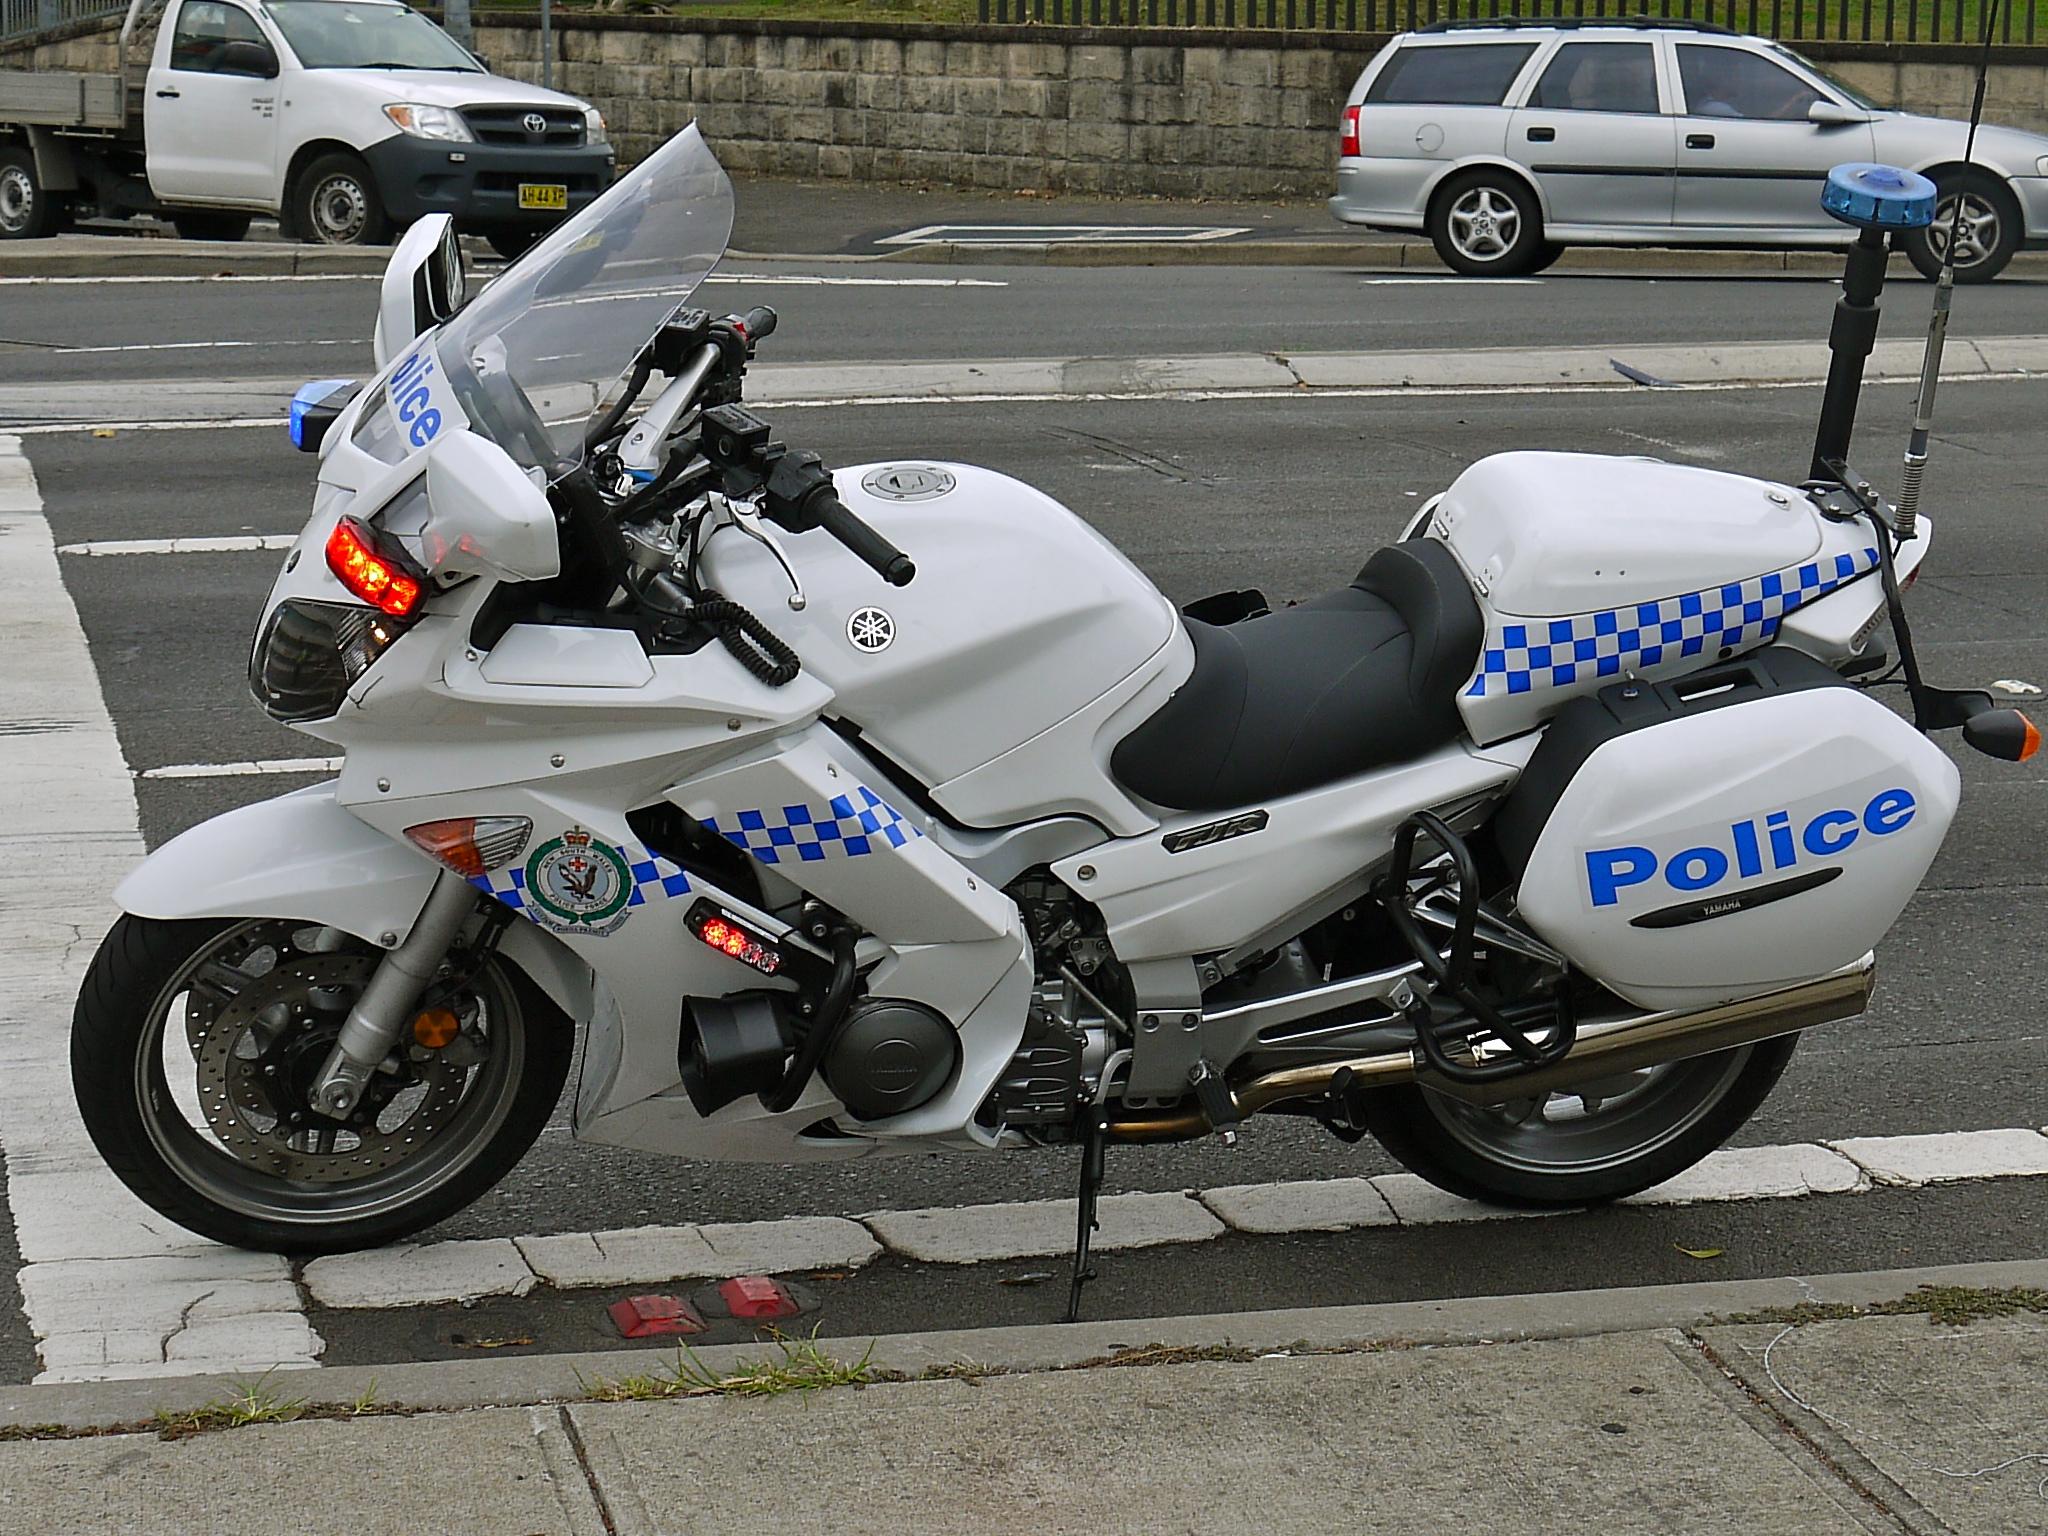 yamaha fjr 1300 weiss schwarz police mit sockel 1 18 maisto modell motorrad. Black Bedroom Furniture Sets. Home Design Ideas